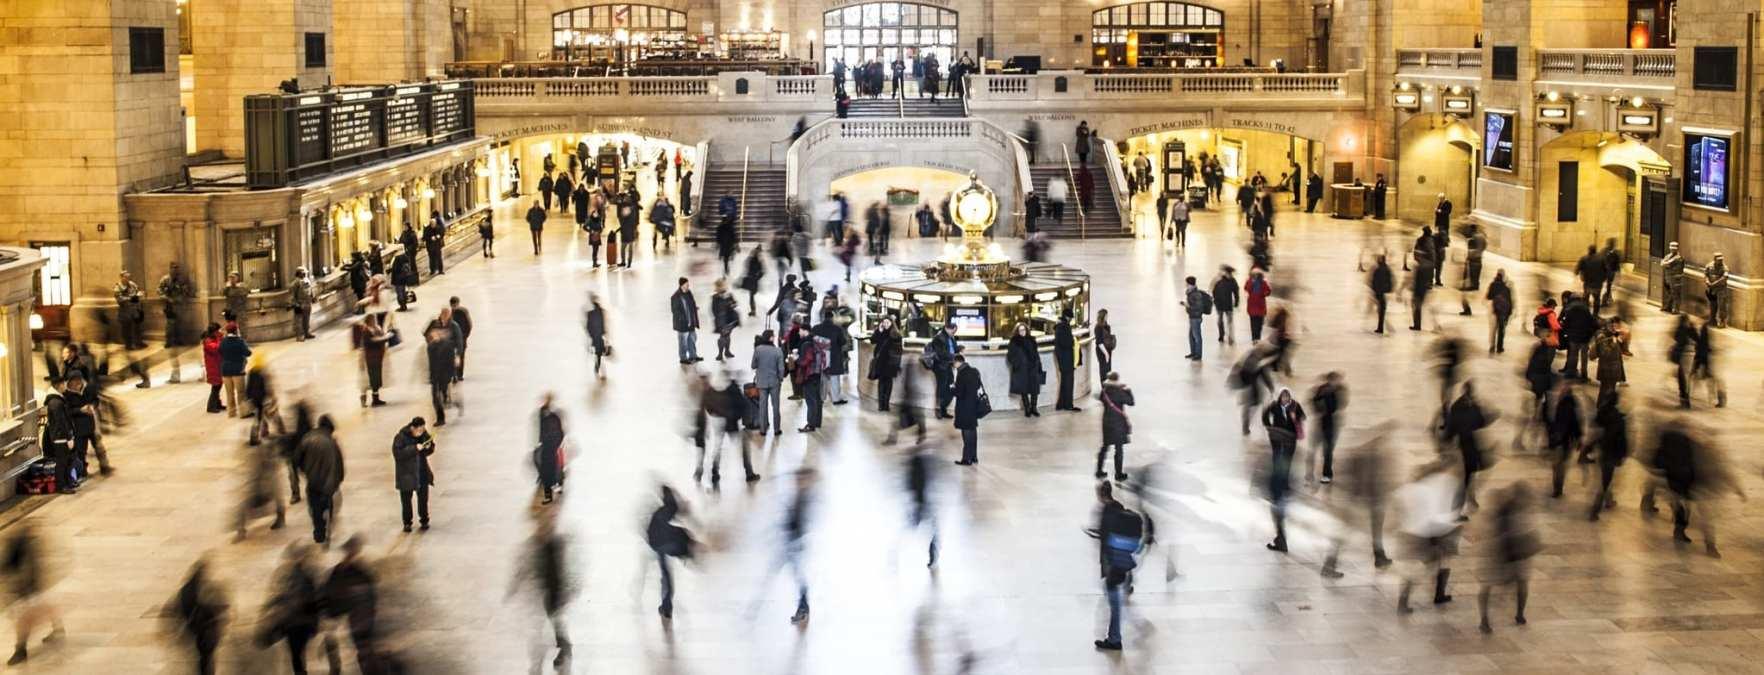 Strengthening Customer Relations with LOTS – Listen, Observe, Think, Speak